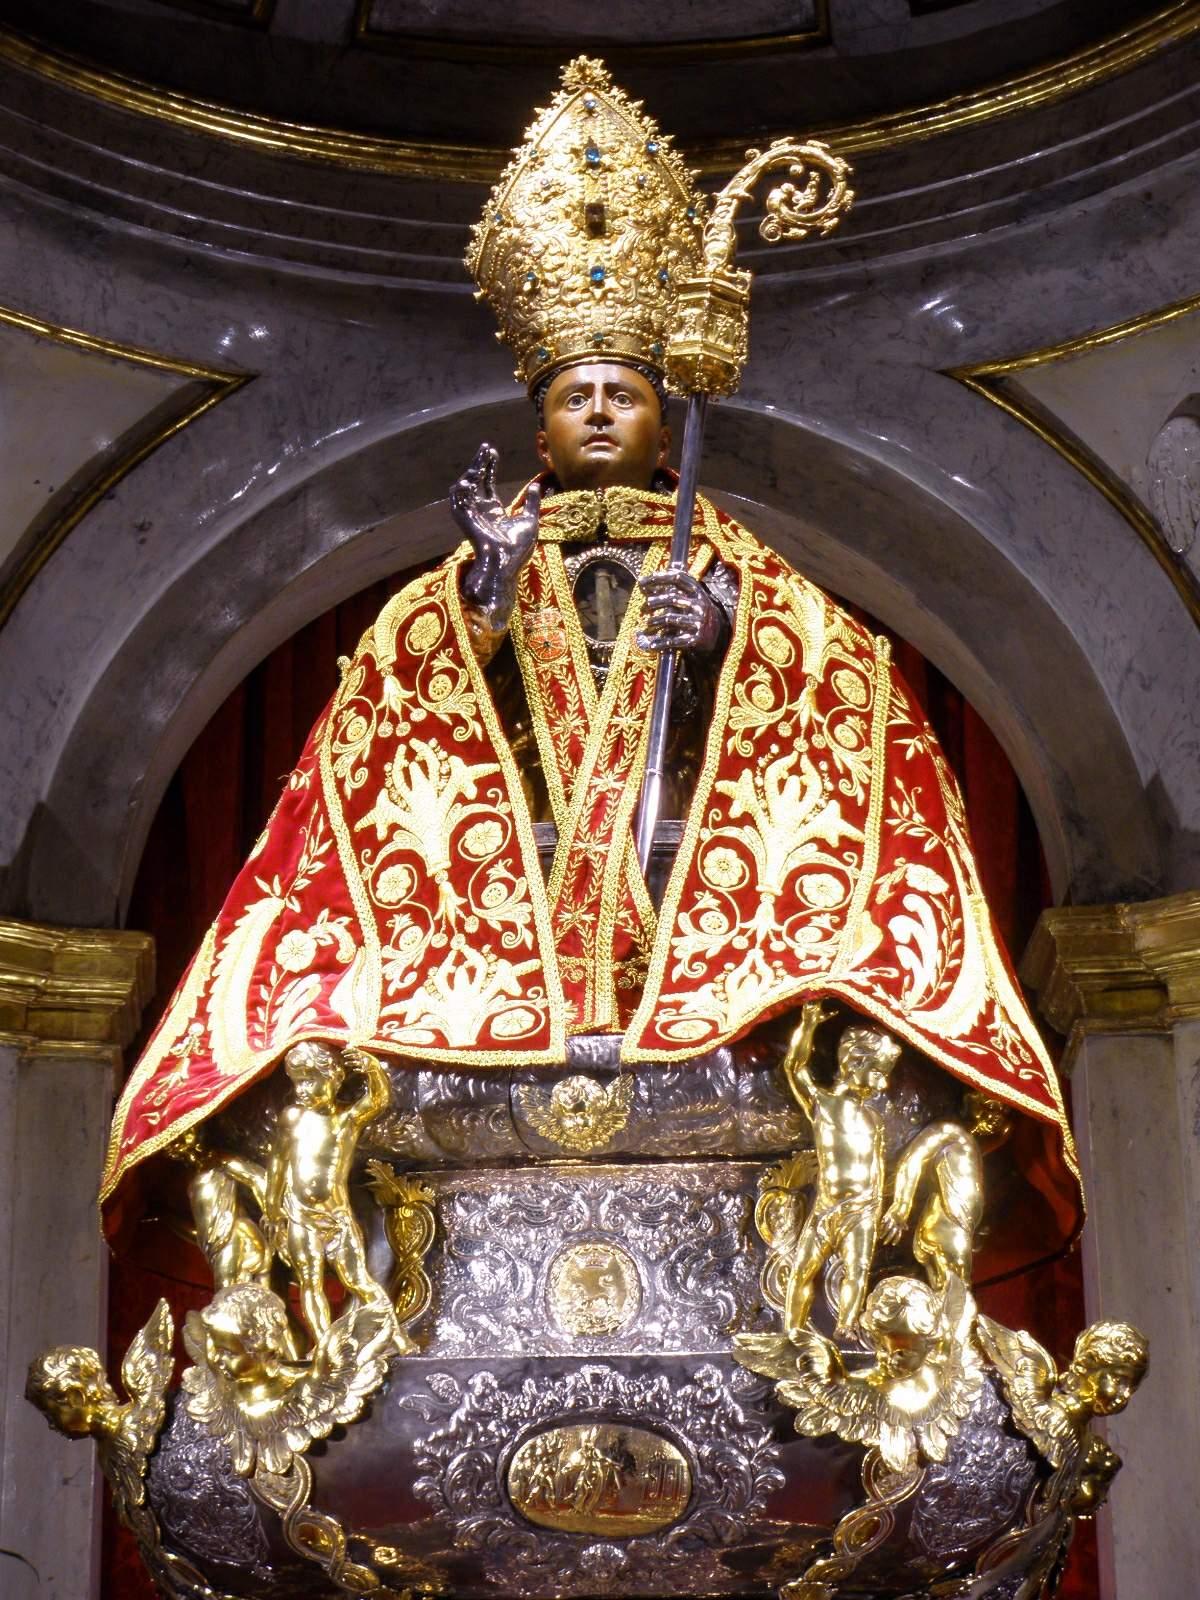 File:Pamplona - Iglesia de San Lorenzo, Capilla de San Fermín 4.JPG -  Wikimedia Commons